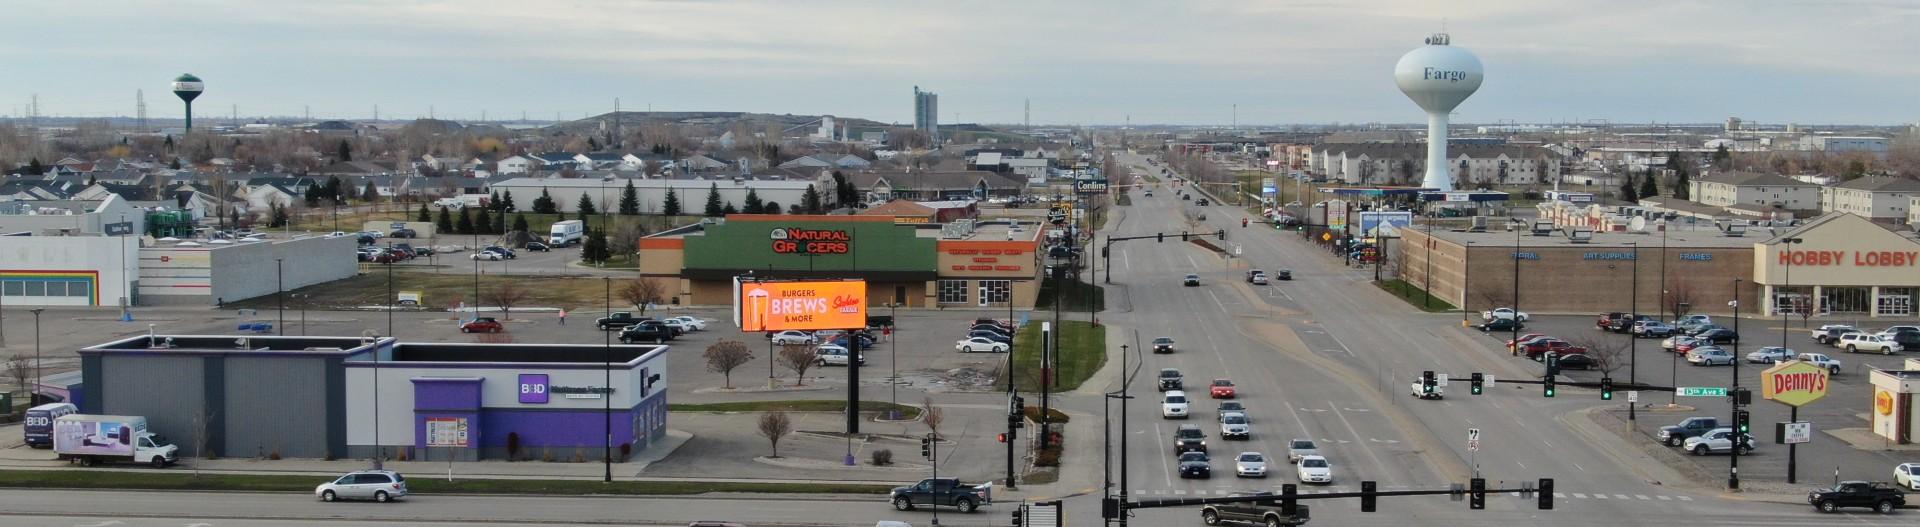 Fargo Digital Billboard